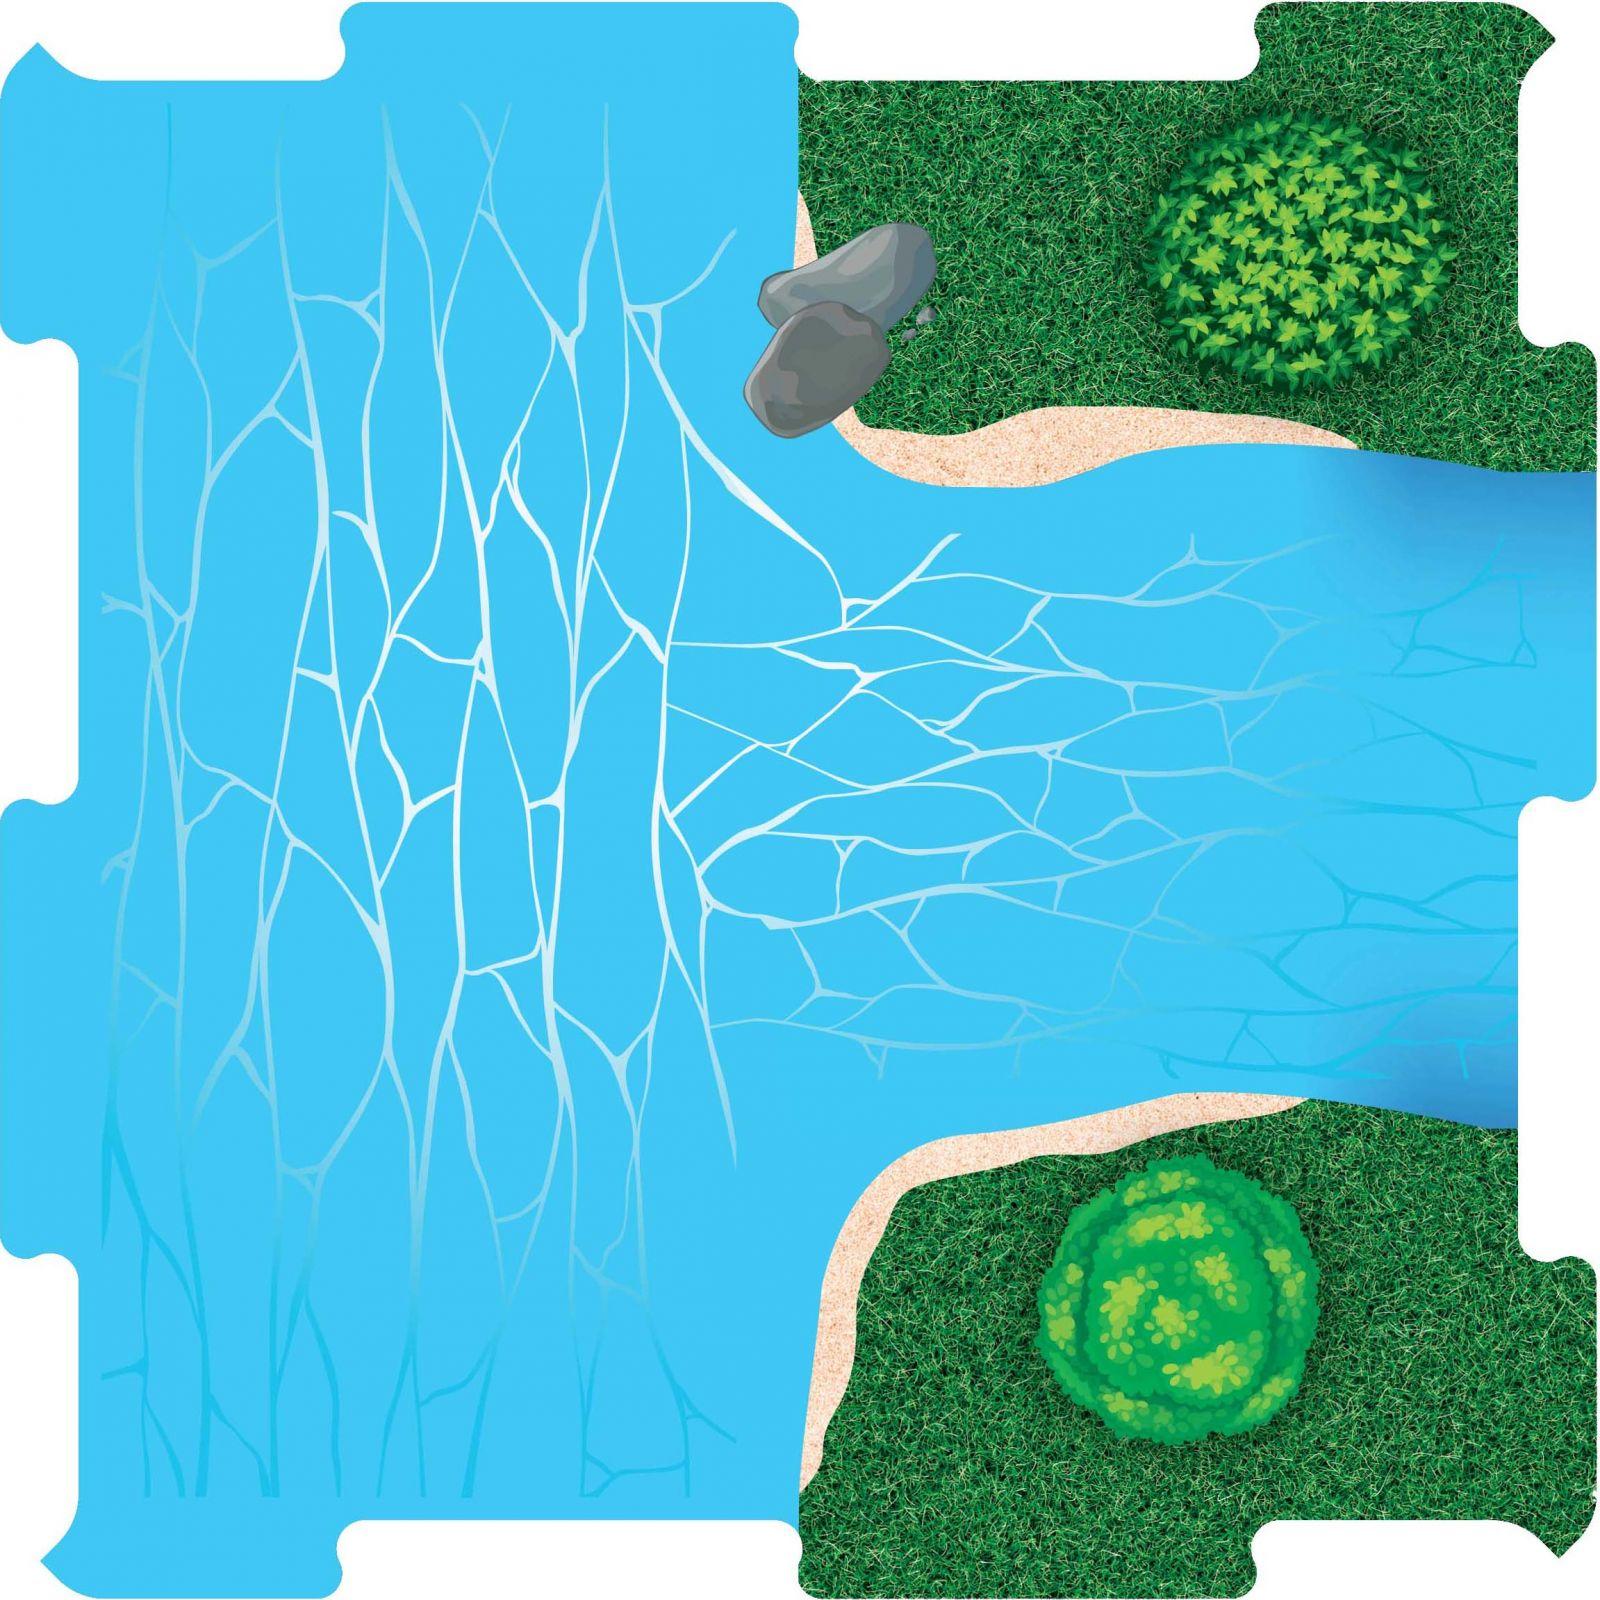 Podlahove puzzle usti reky